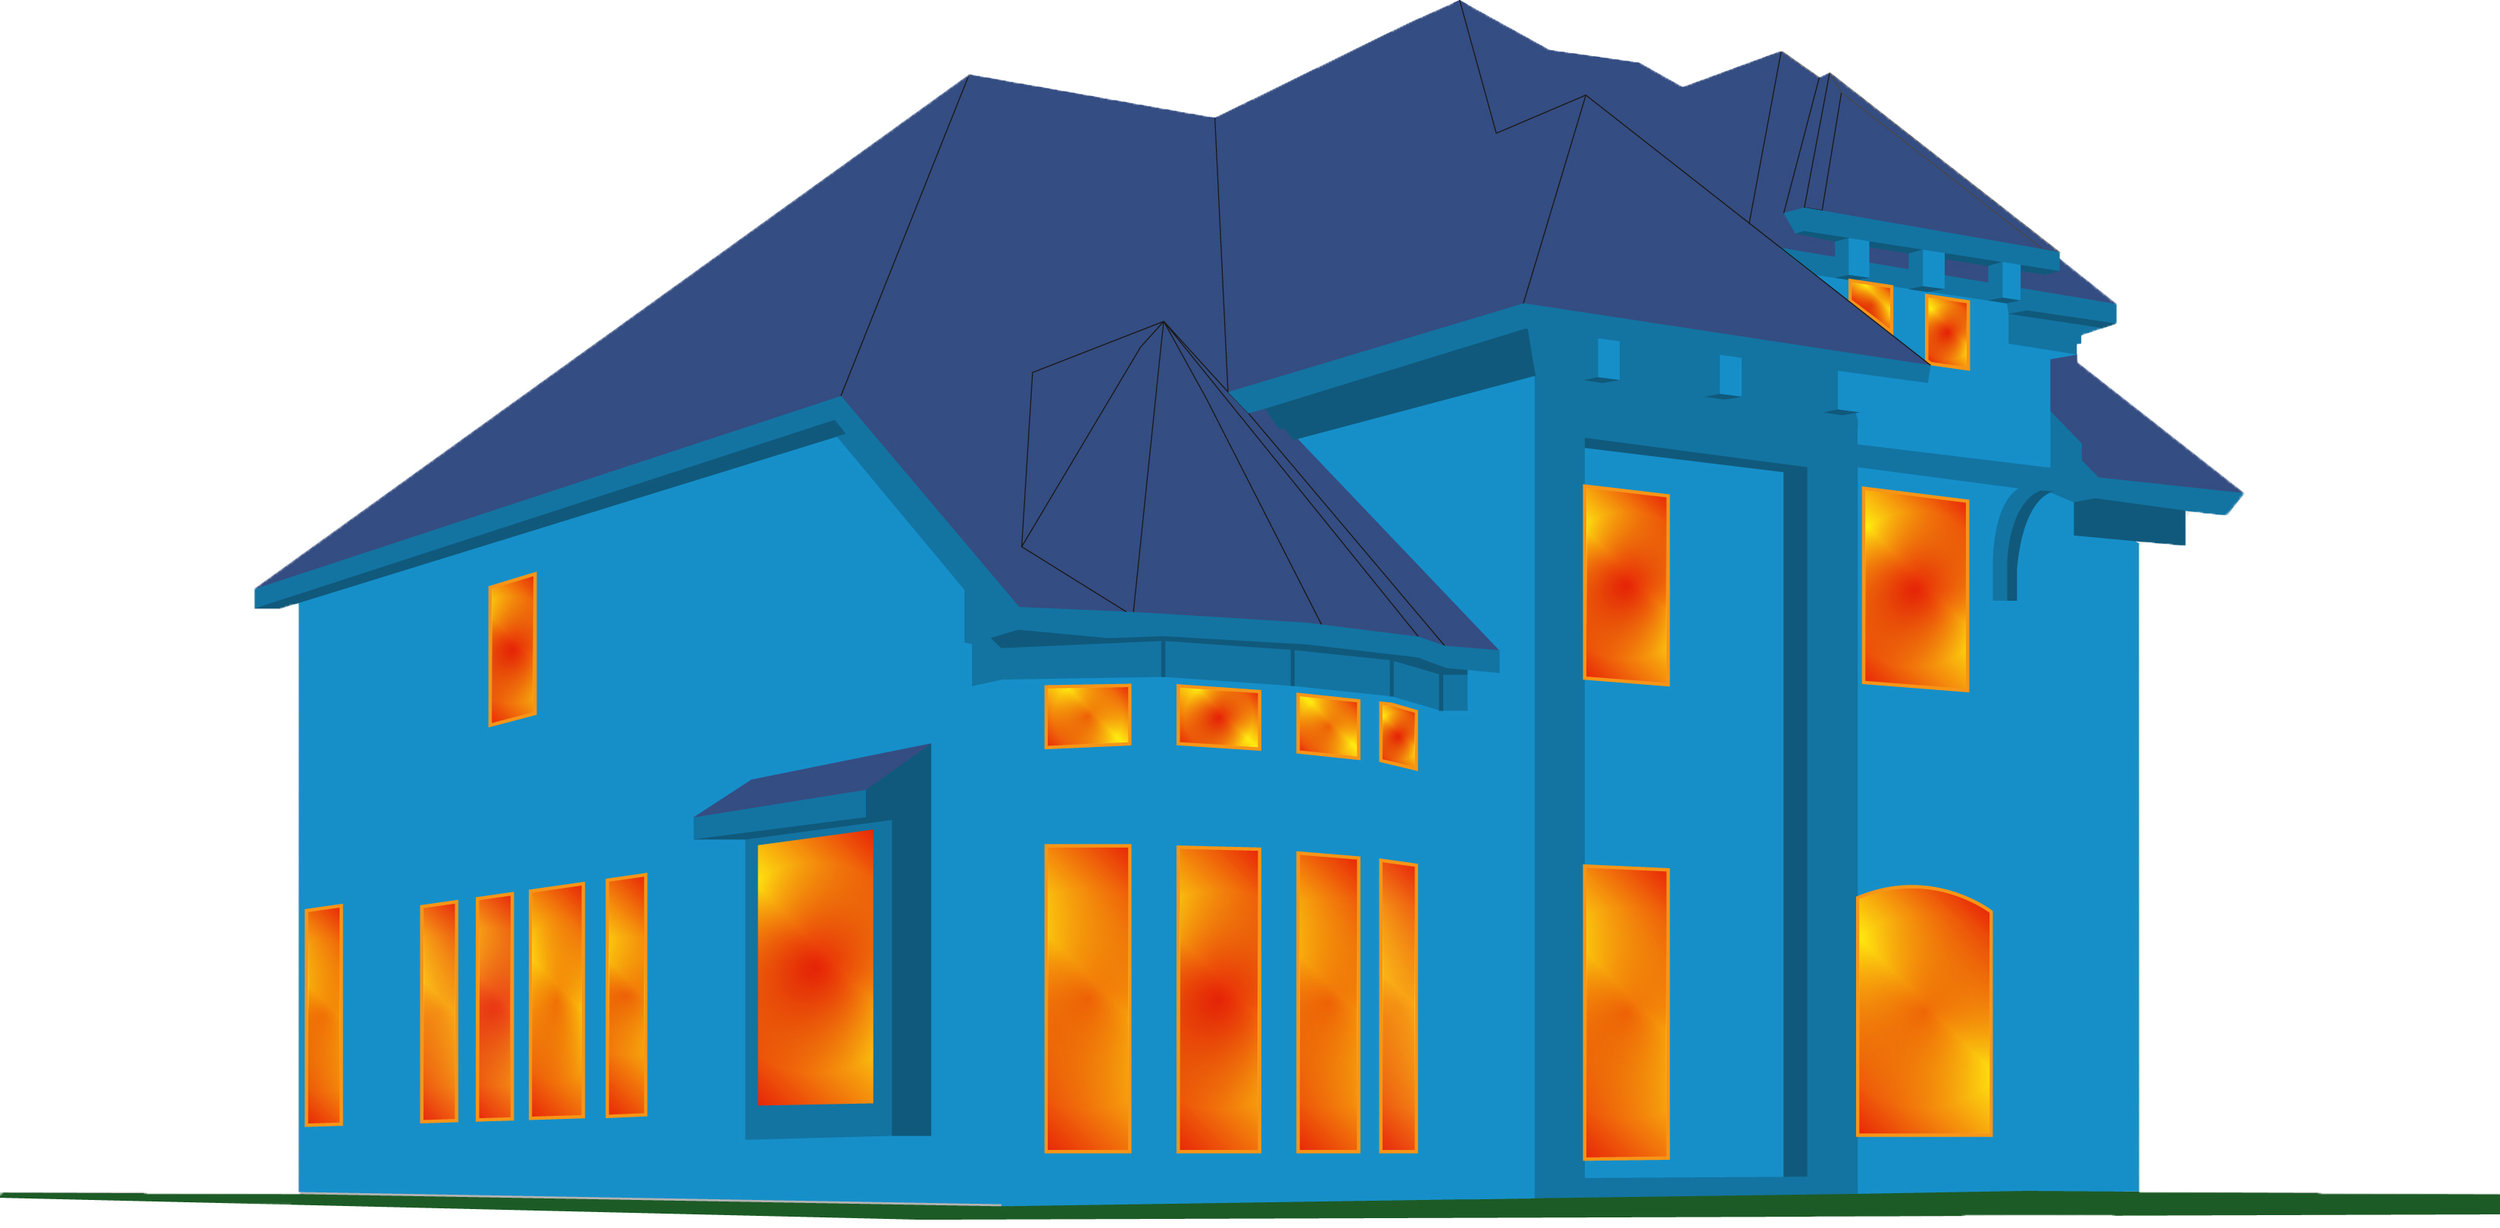 House-Infrared-Remax-NoGarage After CI.jpg